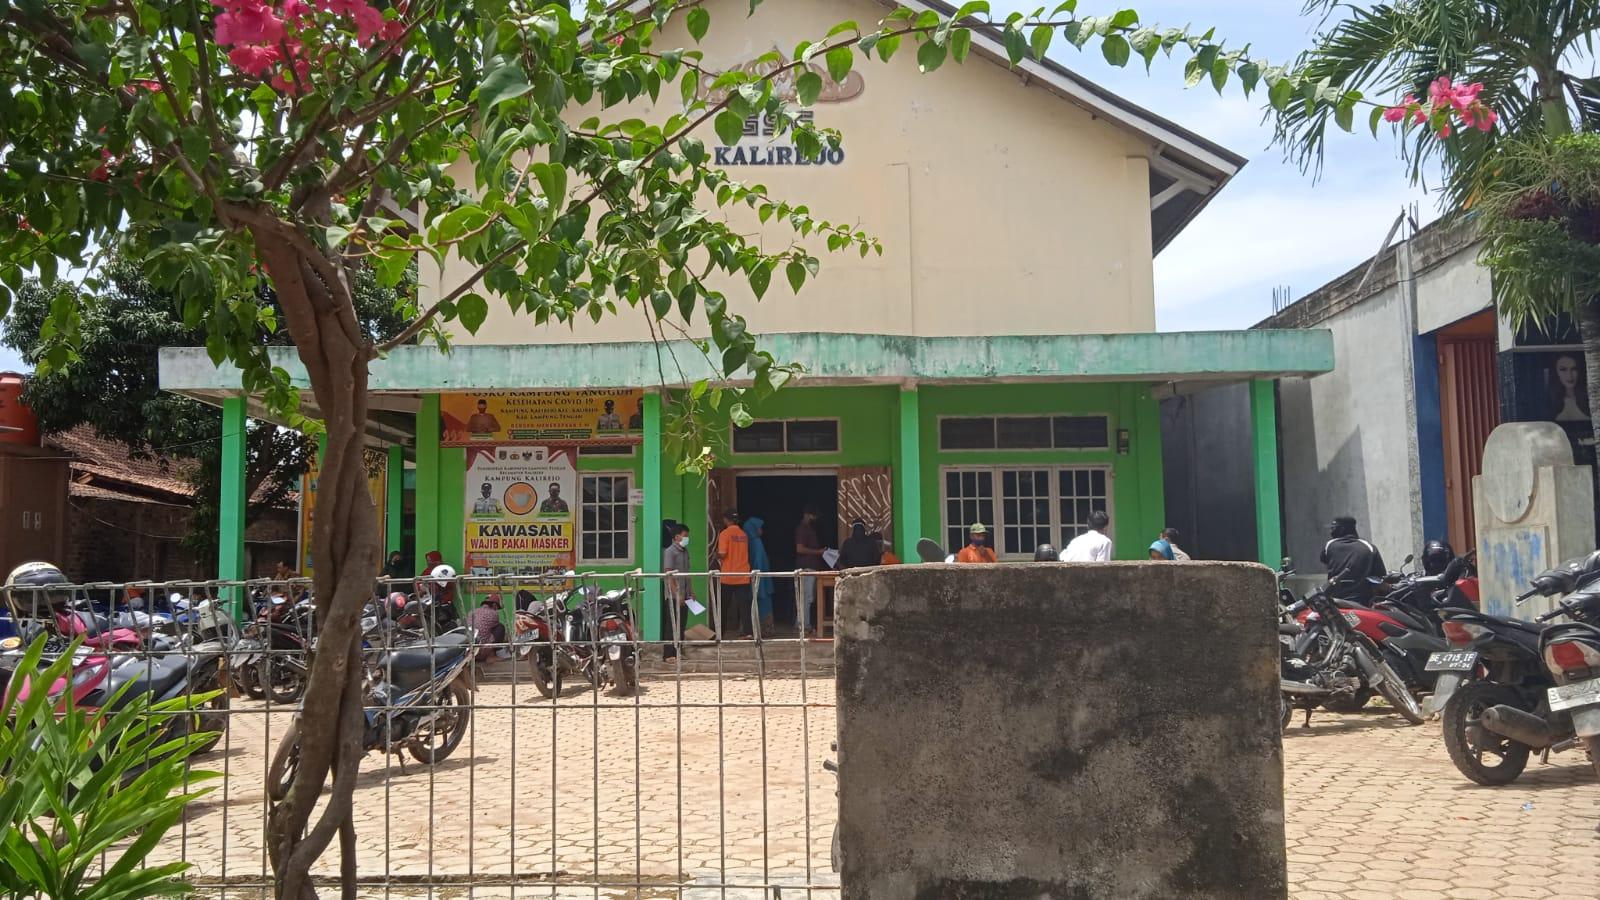 Photo of Jadwal Di Kampung Kalirejo Dadakan, Vaksin habis Warga Balik Arah Sementara